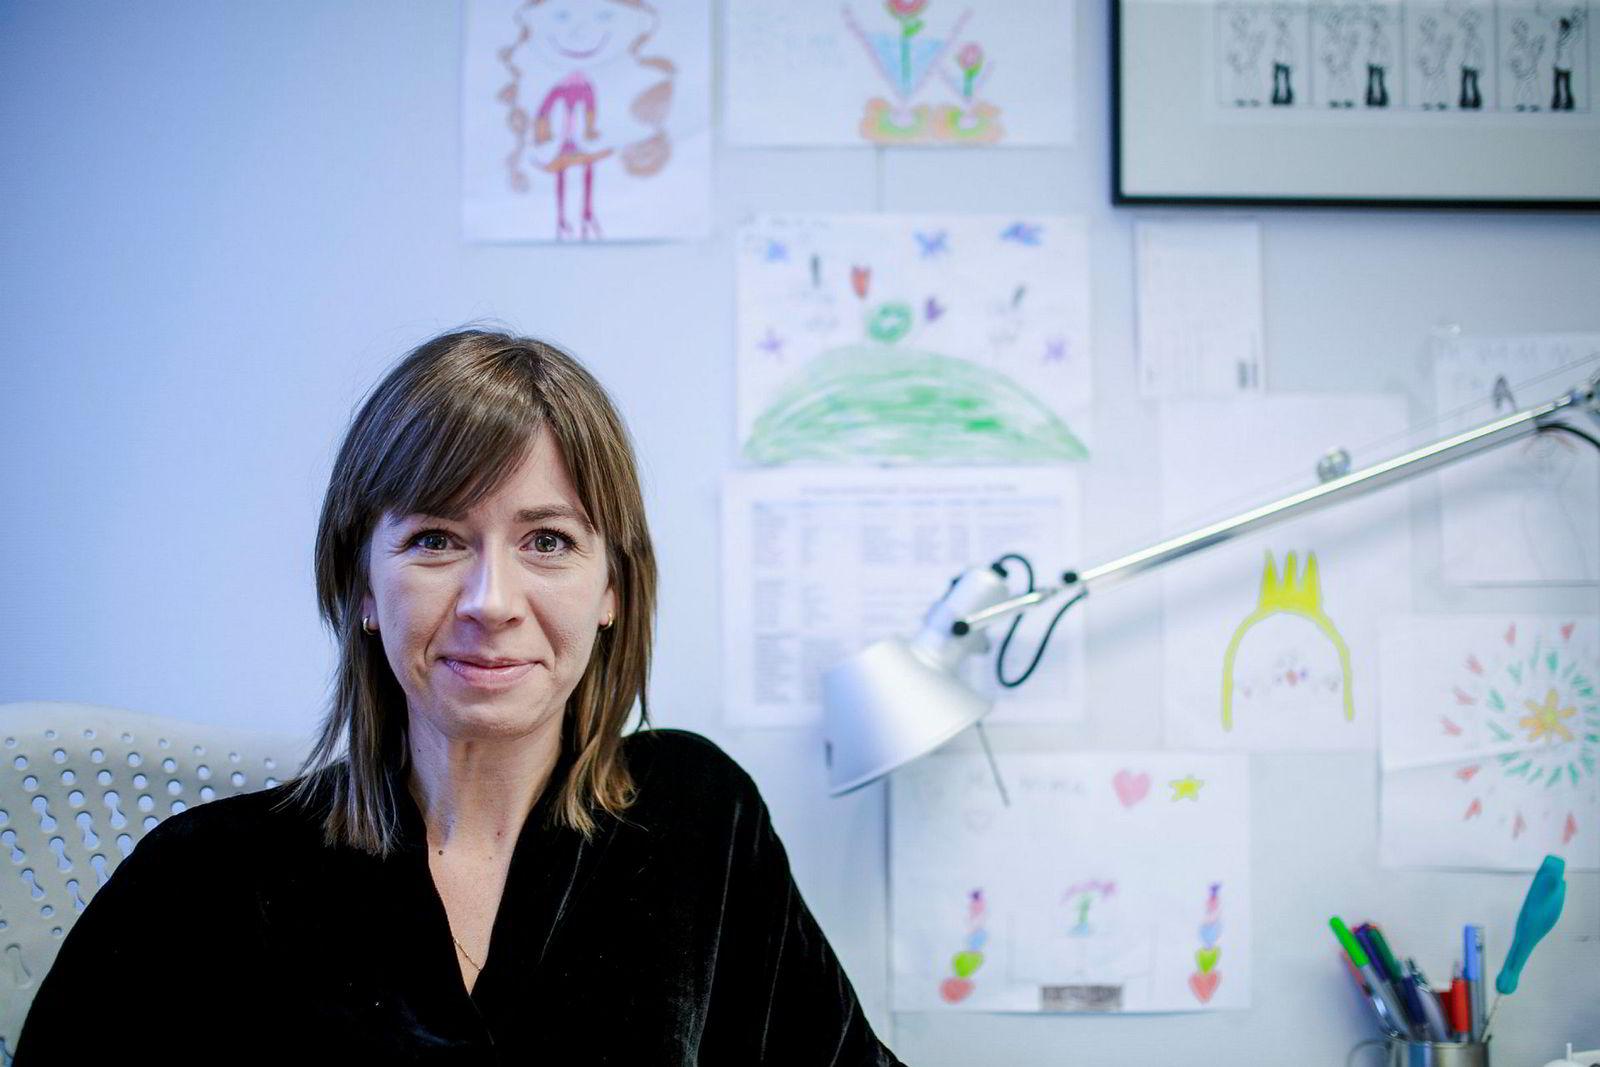 Administrerende direktør Heidi Austlid i IKT-Norge.